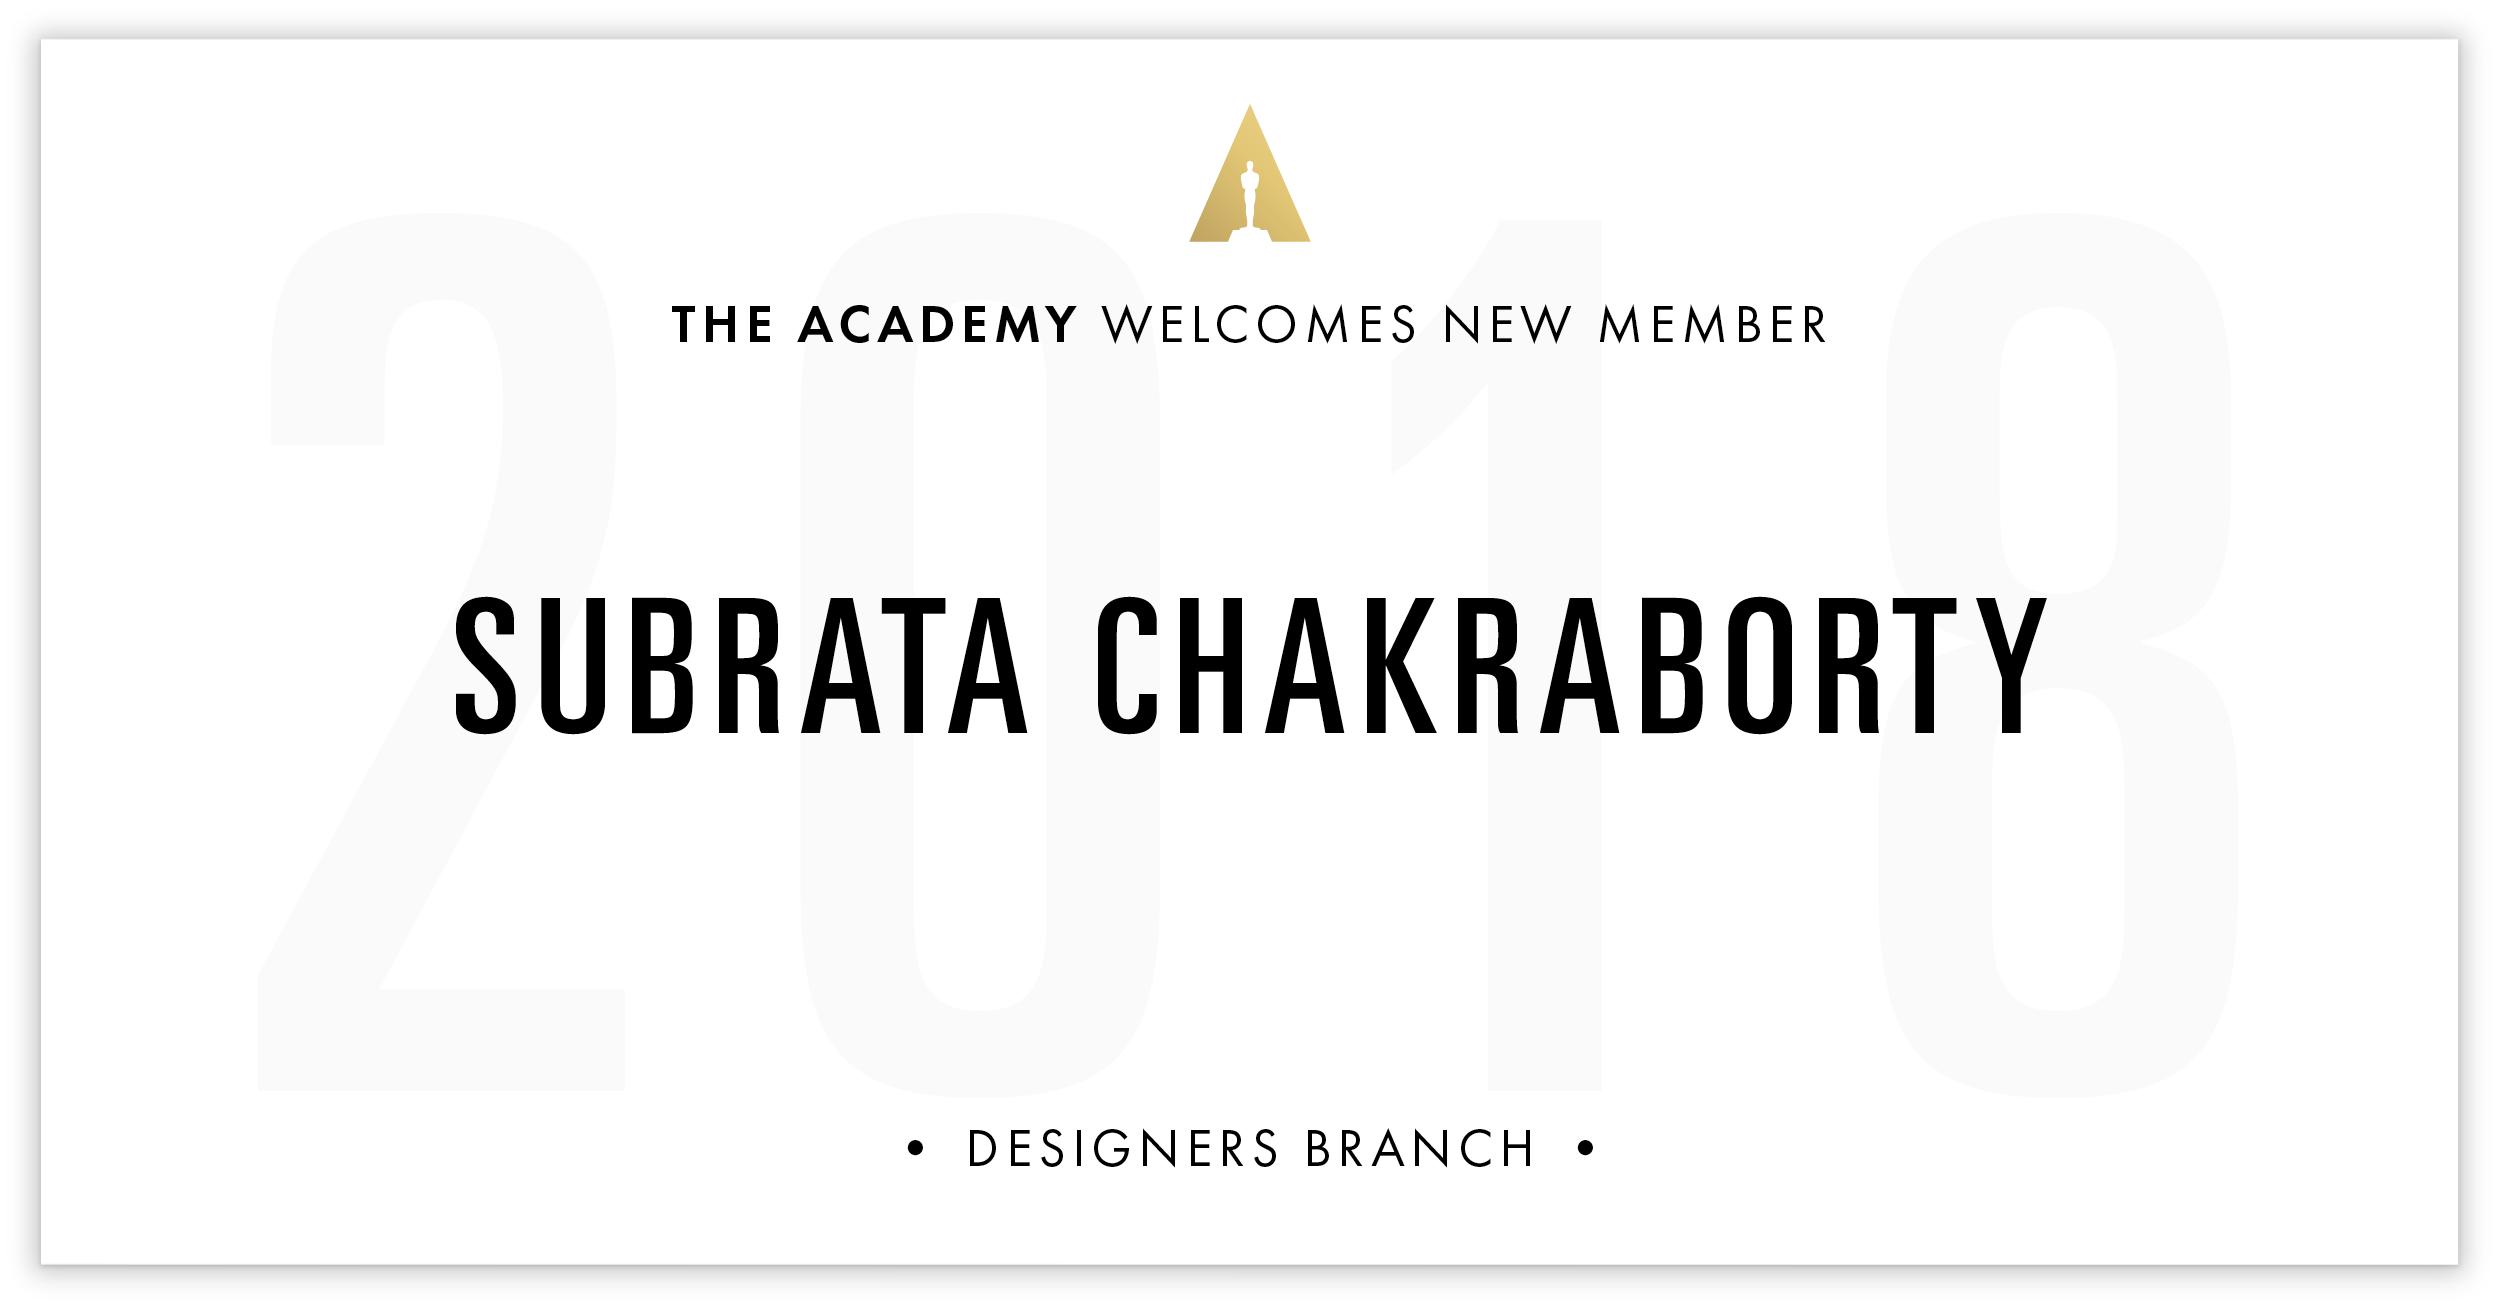 Subrata Chakraborty is invited!